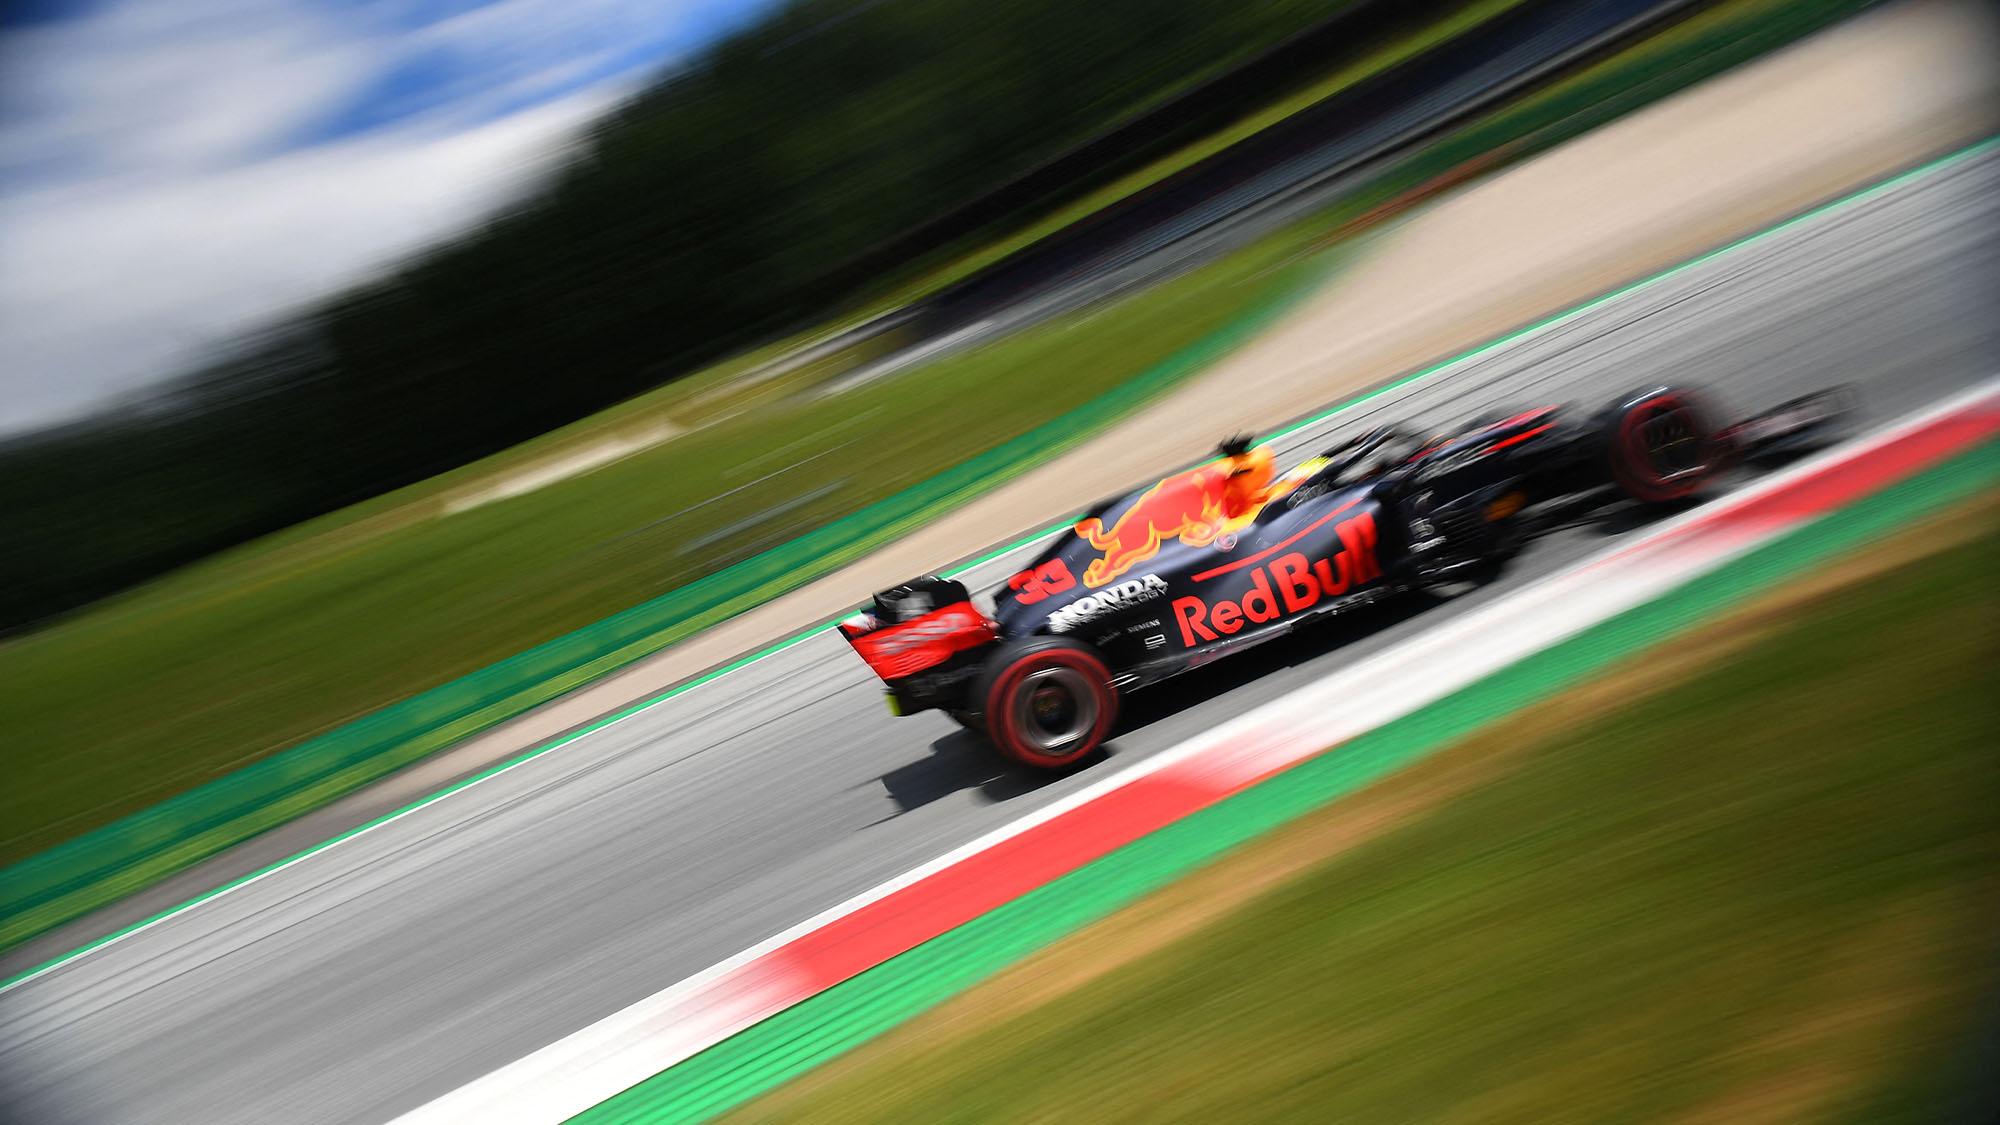 Max Verstappen in practice for the 2021 Styrian Grand Prix